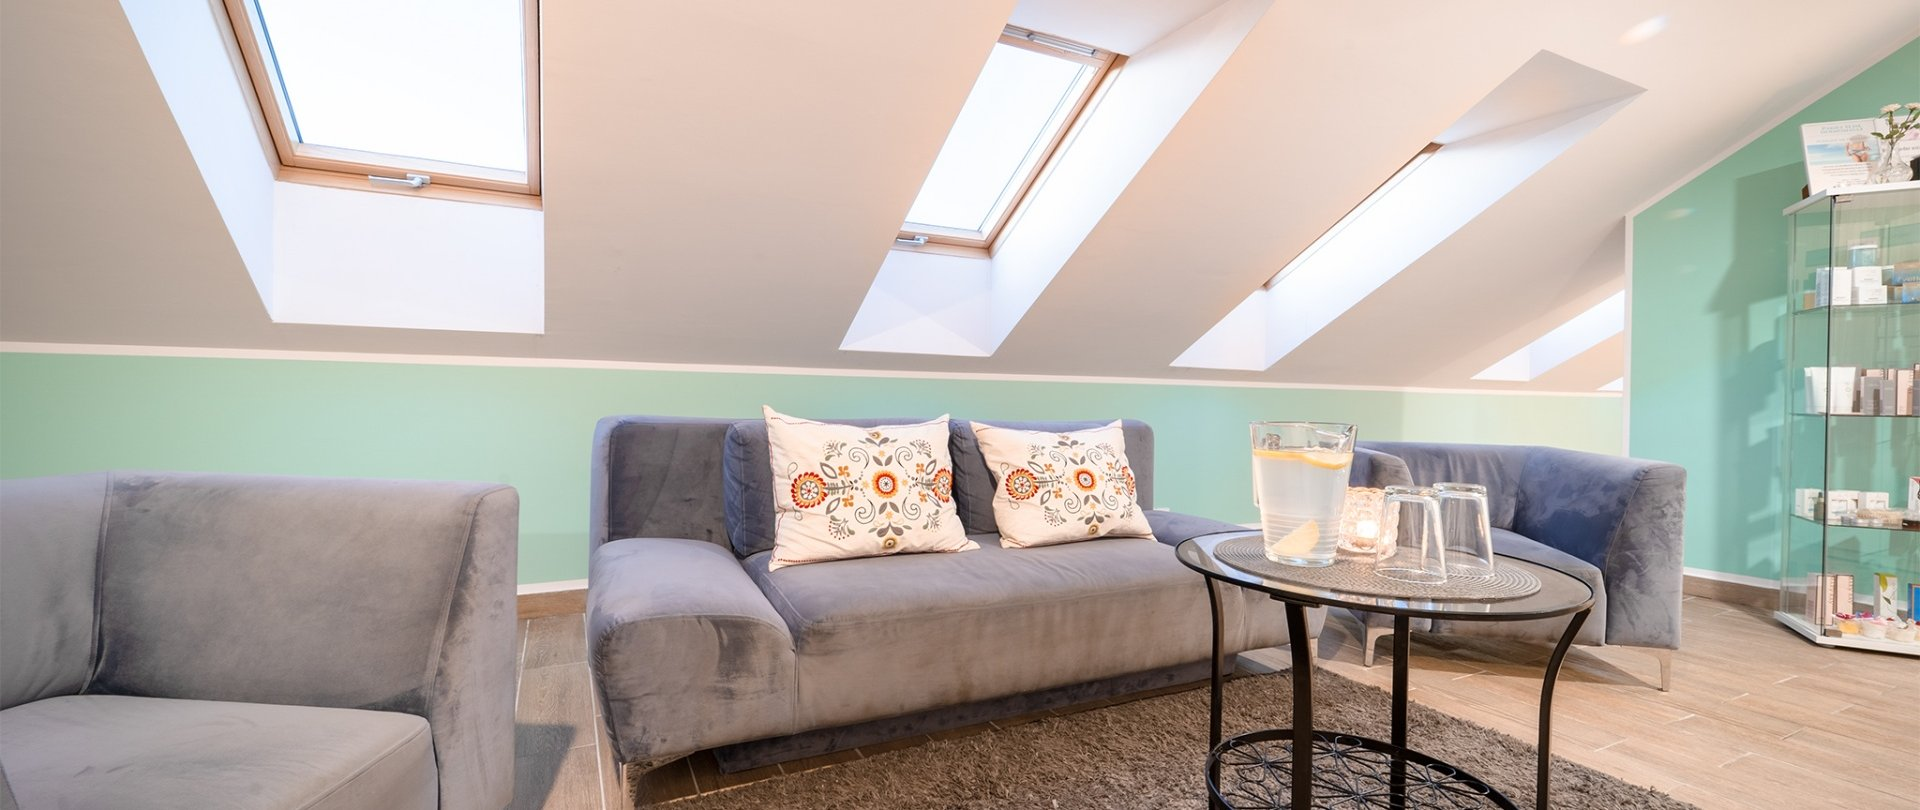 Guest Rooms Gdansk Zabianka: Cheap Accommodation In Poland